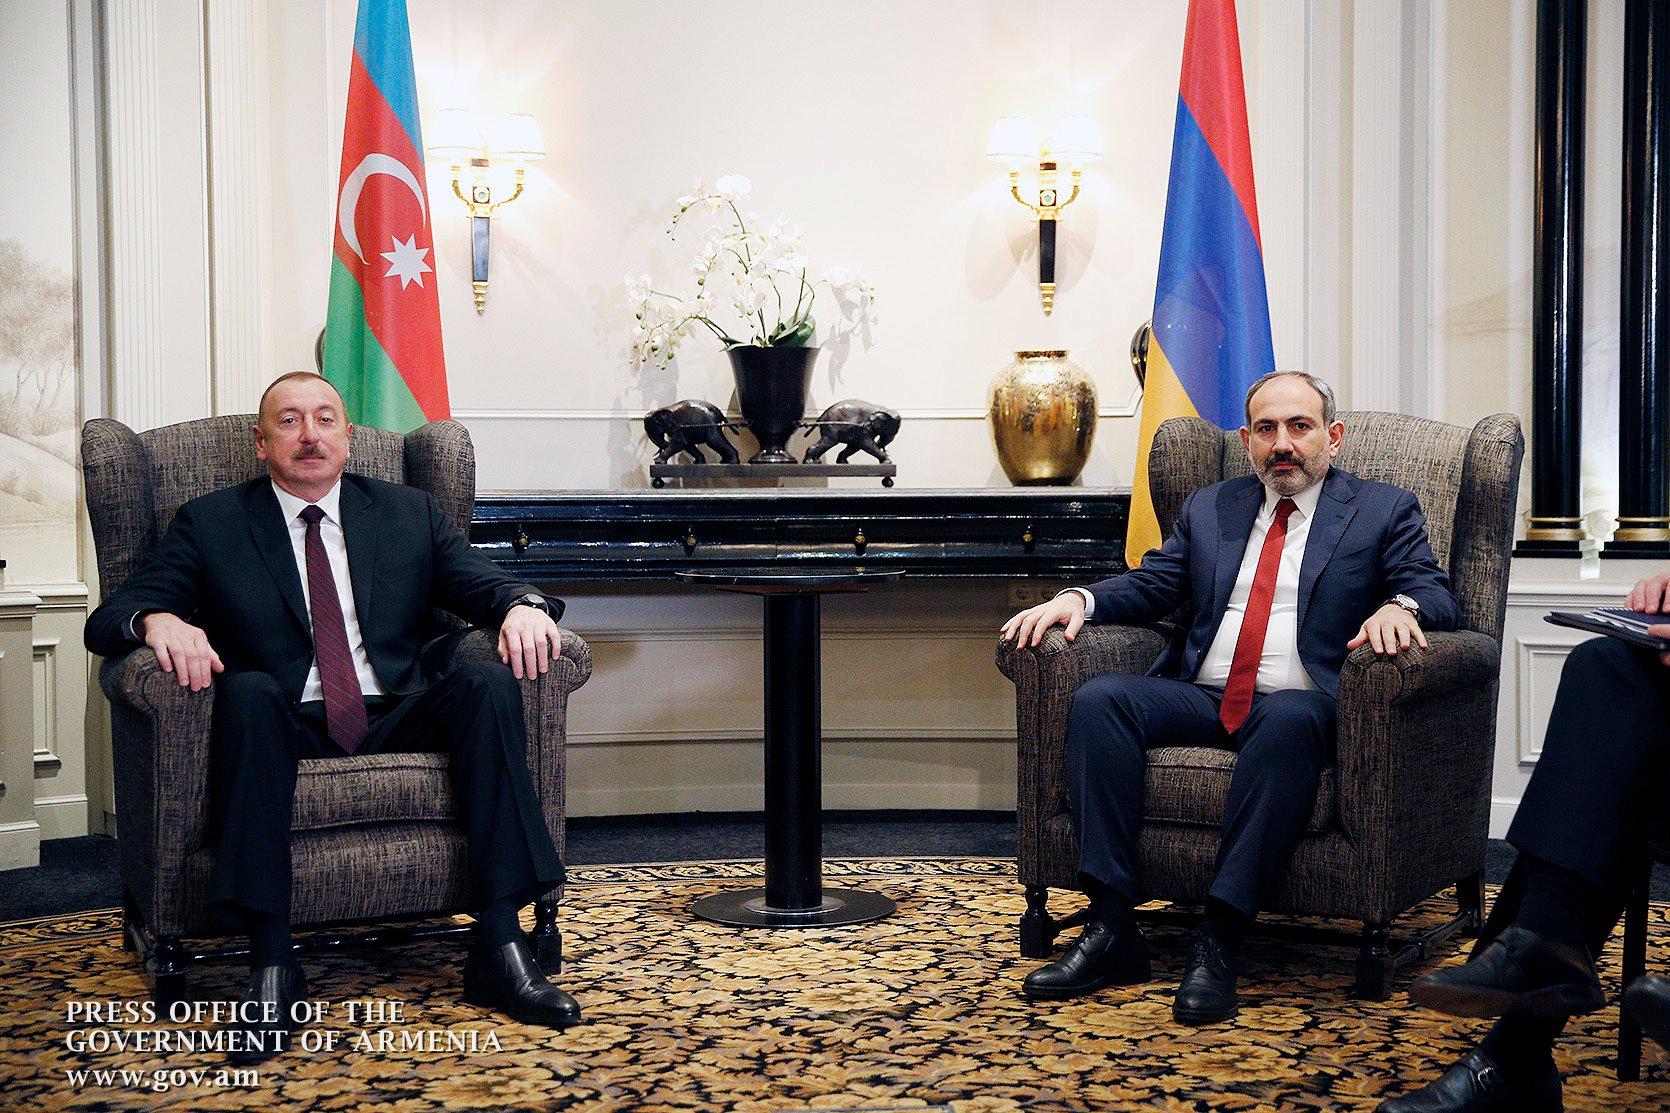 Photo of Ադրբեջանի կողմից նոր սադրանքների դեպքում Հայաստանին անհրաժեշտ են  նոր դիվանագիտական ձևակերպումներ